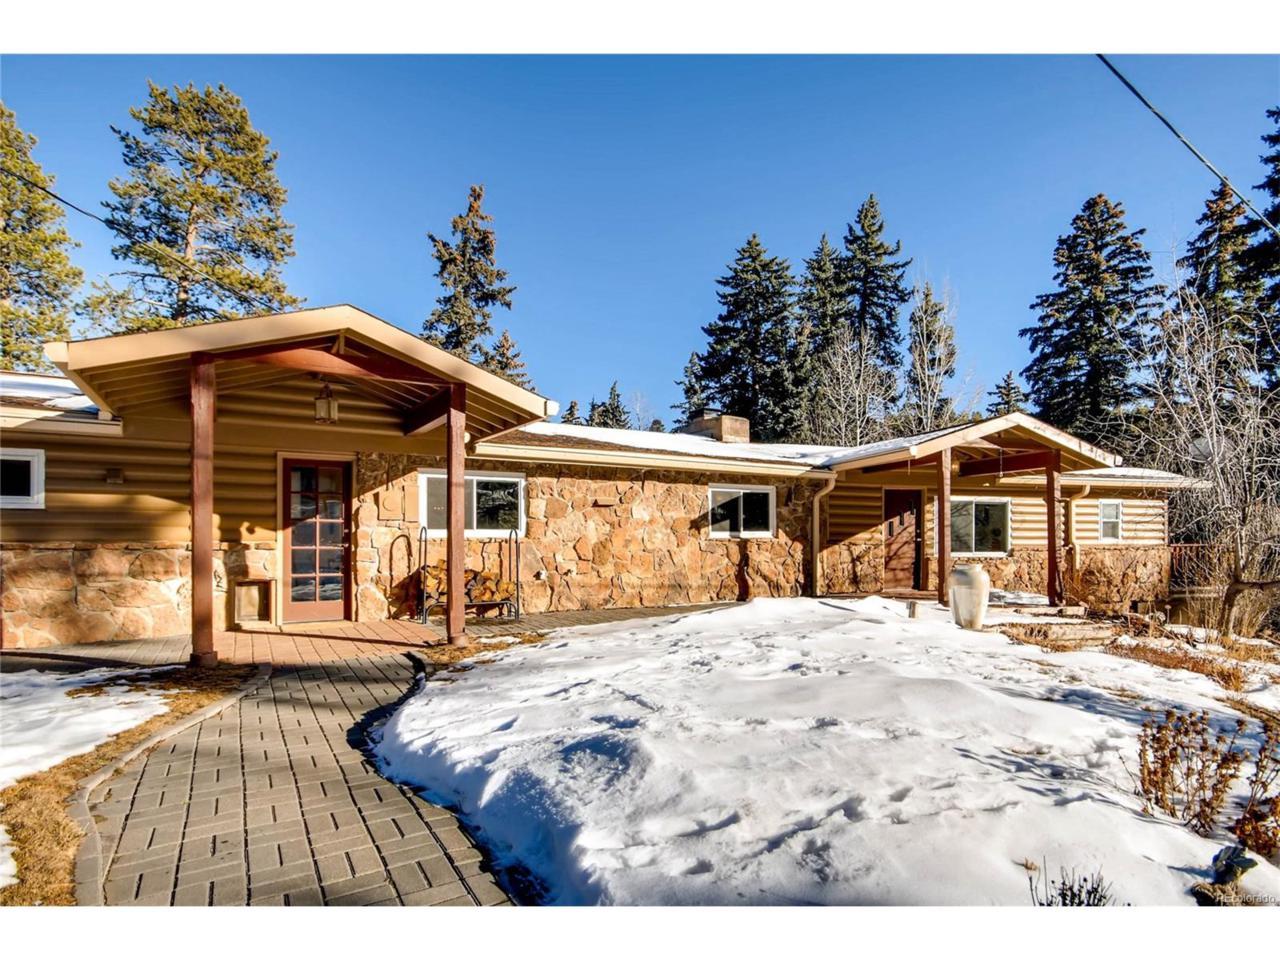 28340 Pine Trail, Conifer, CO 80433 (MLS #3271571) :: 8z Real Estate